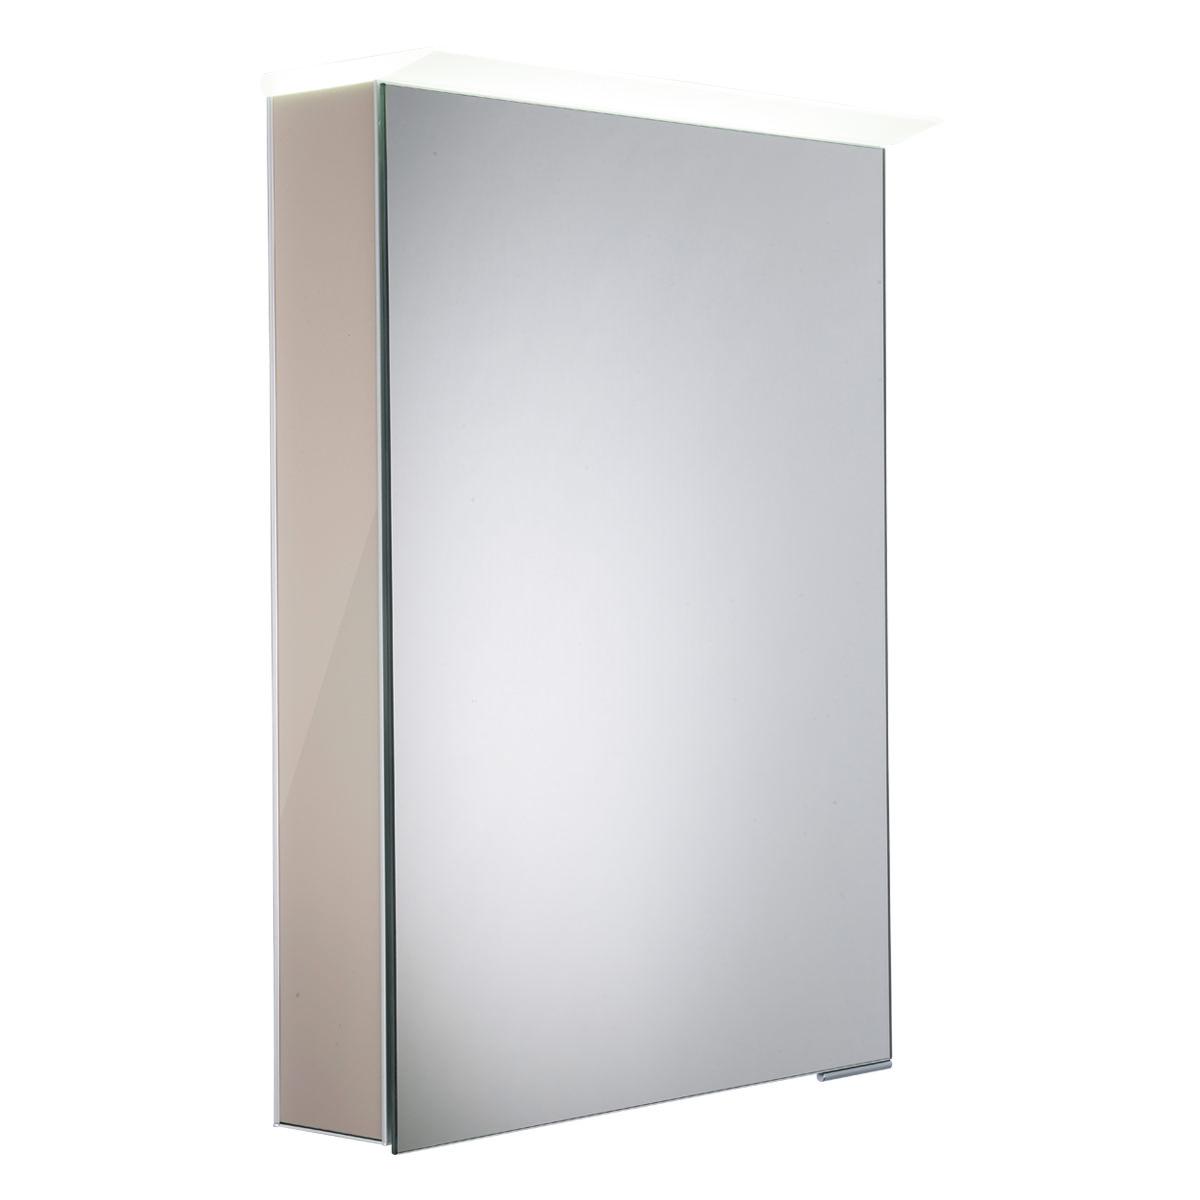 Roper Rhodes Virtue Gloss Warm Grey Led Mirror Cabinet